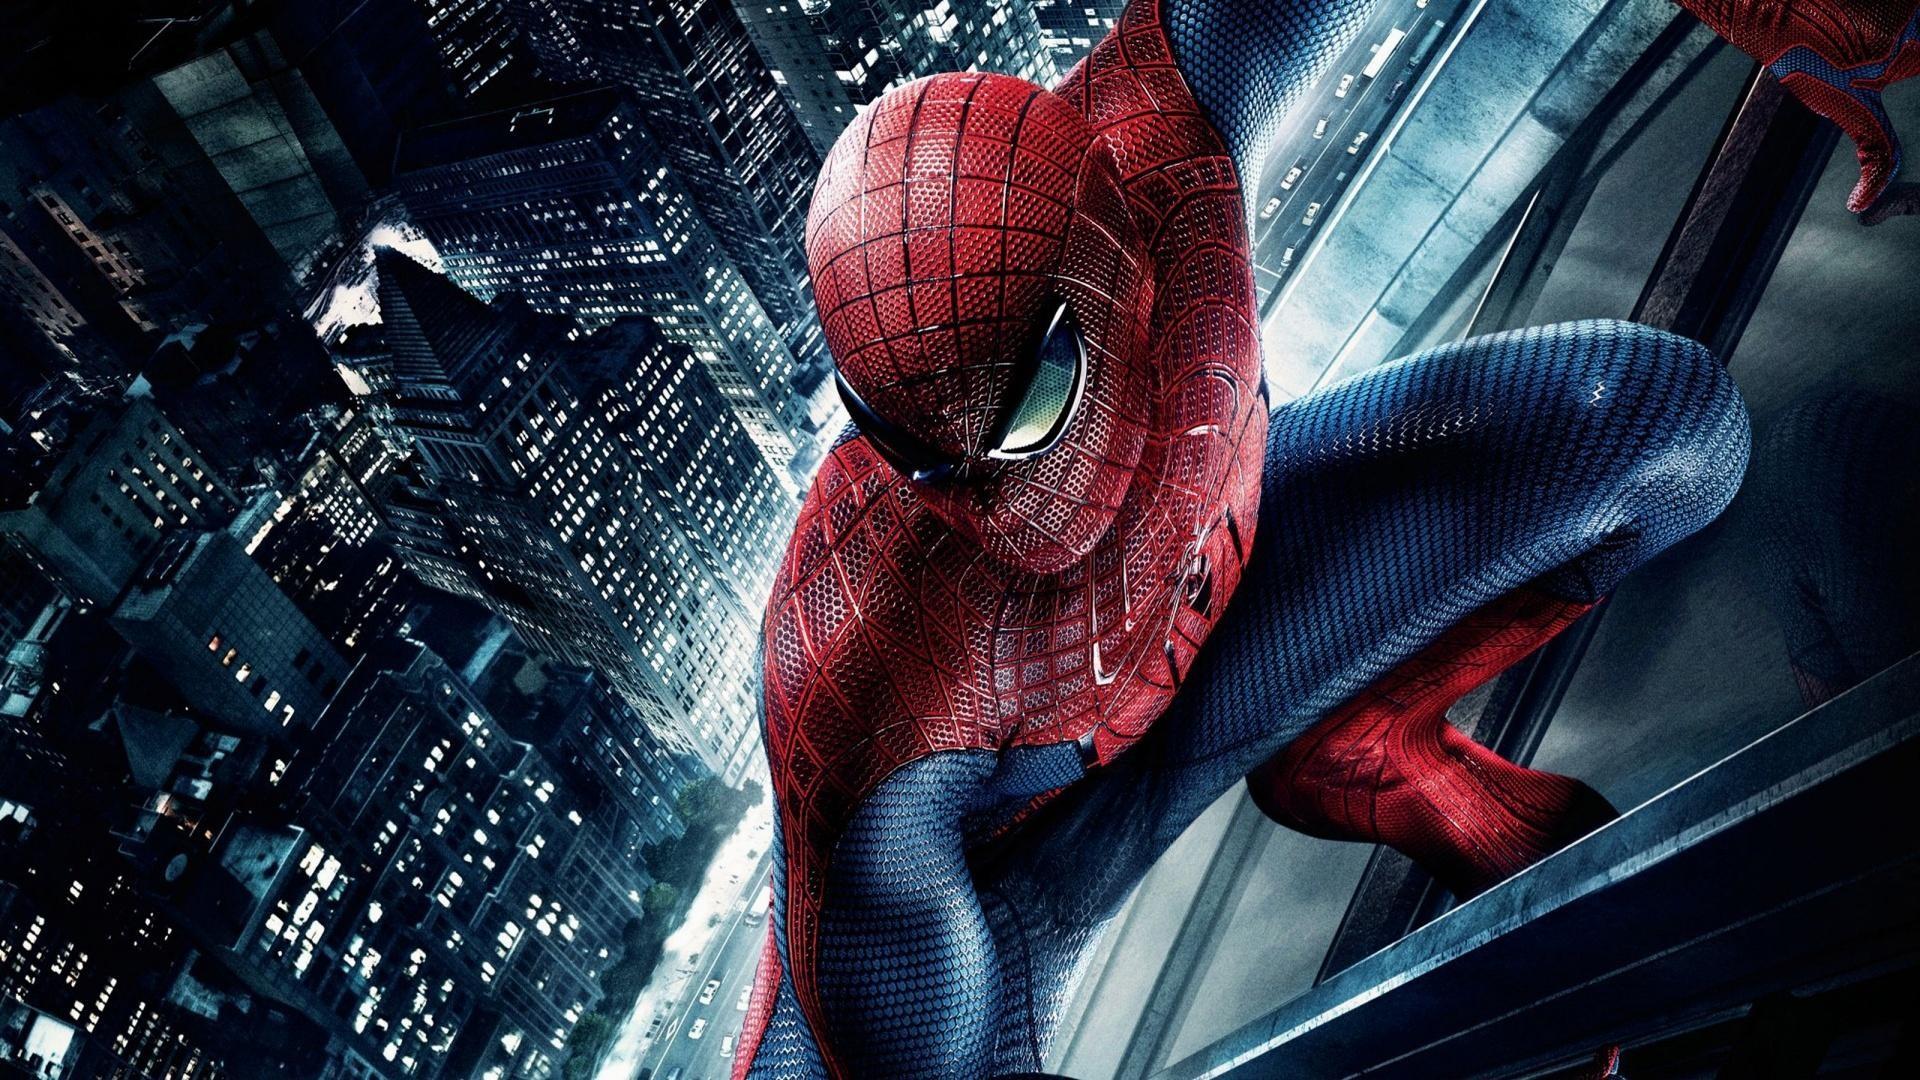 wallpaper.wiki-The-Amazing-Spider-Man-HD-1920×1080-